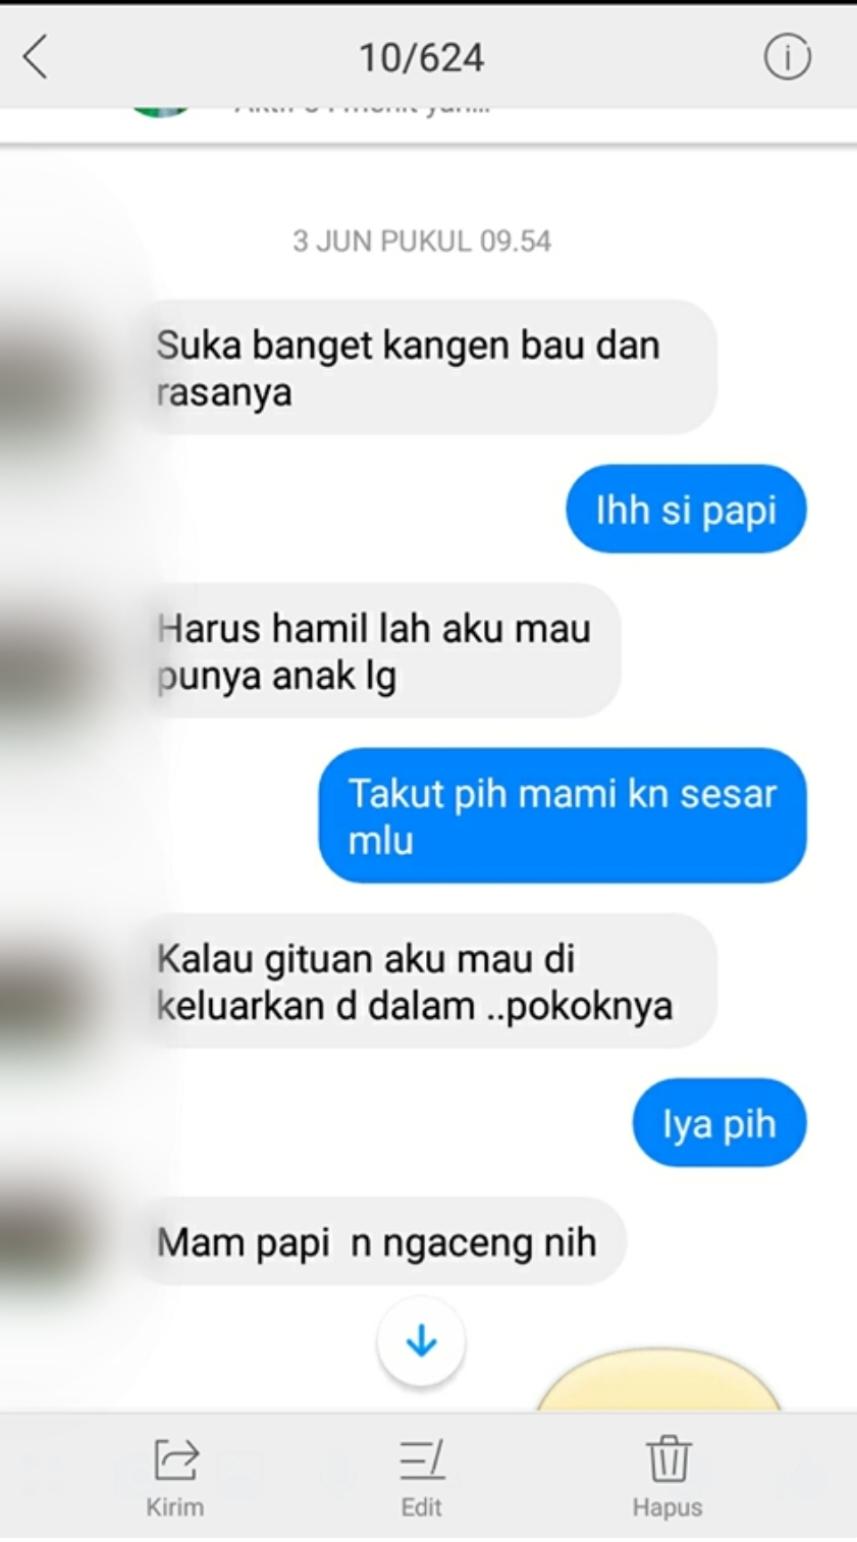 Dugaan perselingkuhan di Cirebon